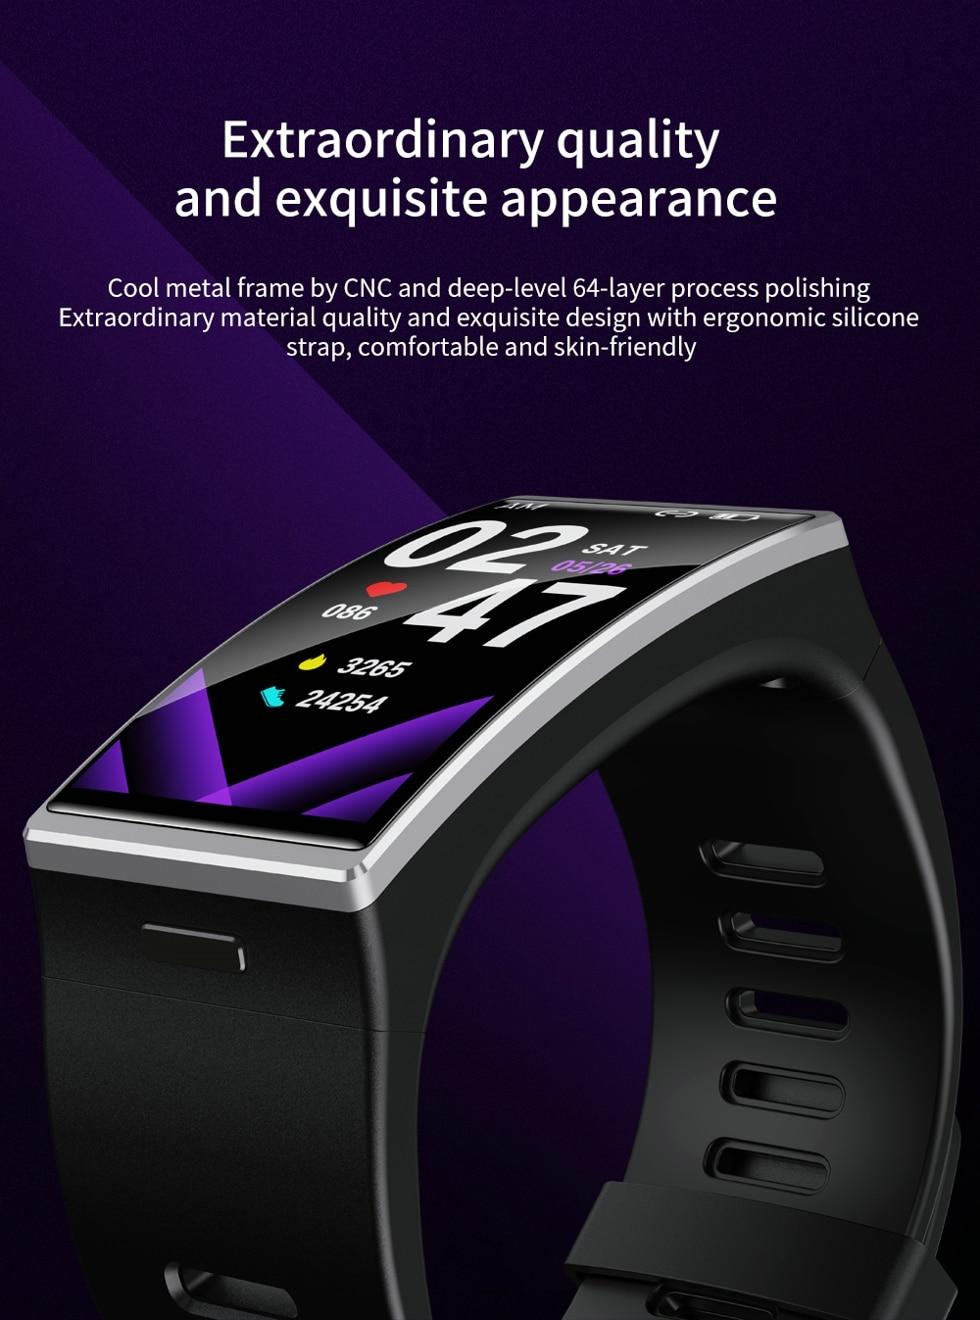 Hea7bf576dc374a7fa97318003eca7e9aZ Smartwatch 2020 1.9 Inch 170*320 Screen LEMFO DM12 Smart Watch Men IP68 Waterproof Sport Heart Rate Blood Pressure Android IOS